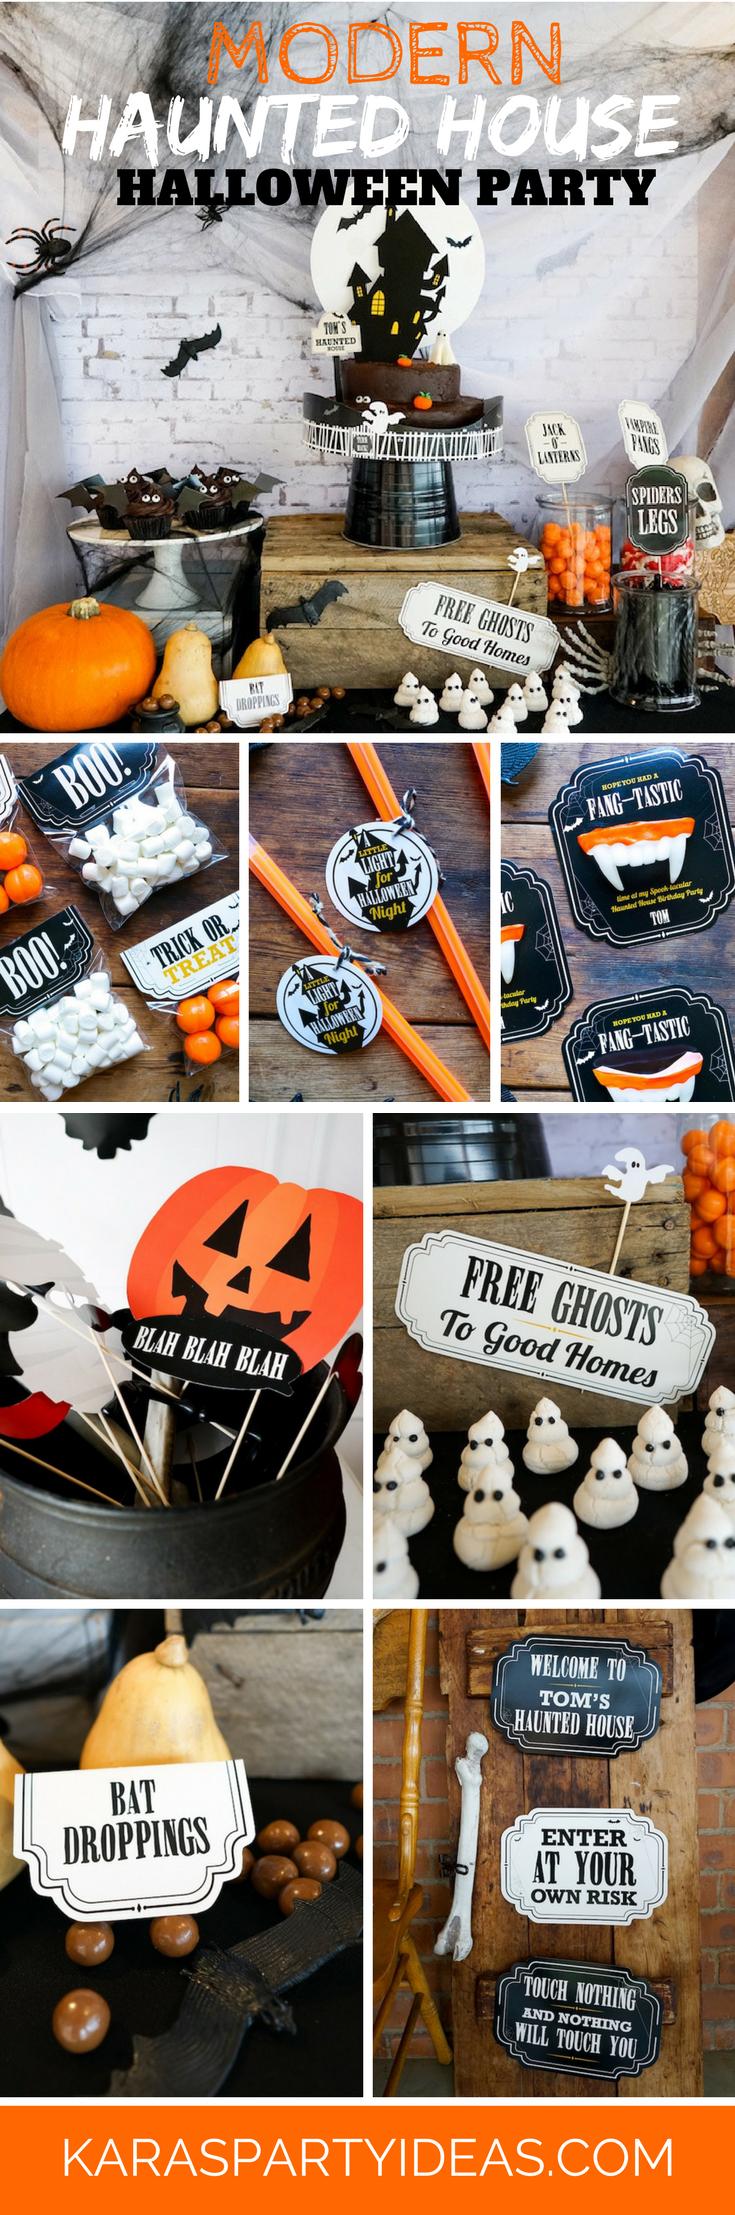 Modern Haunted House Halloween Party via Kara's Party Ideas | KarasPartyIdeas.com